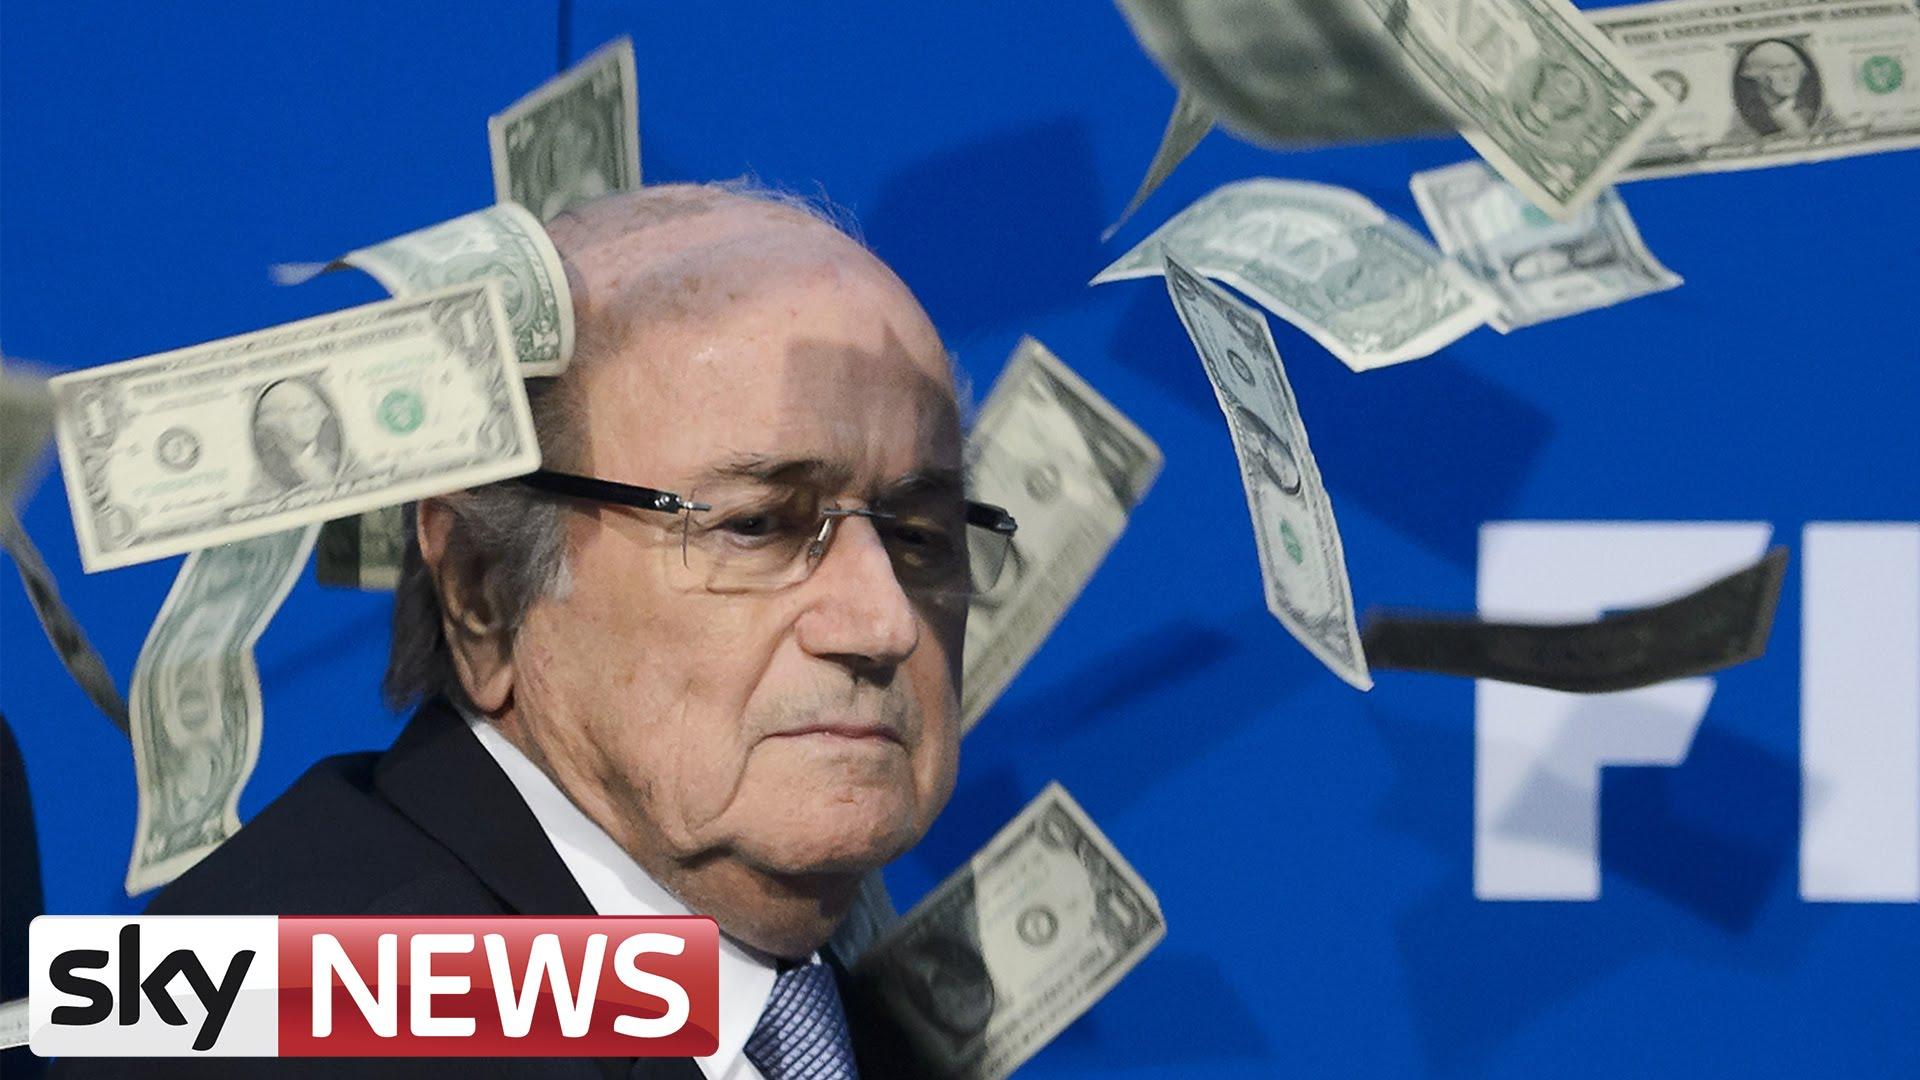 FIFA President Sepp Blatter has money thrown at him by Simon Brodkin